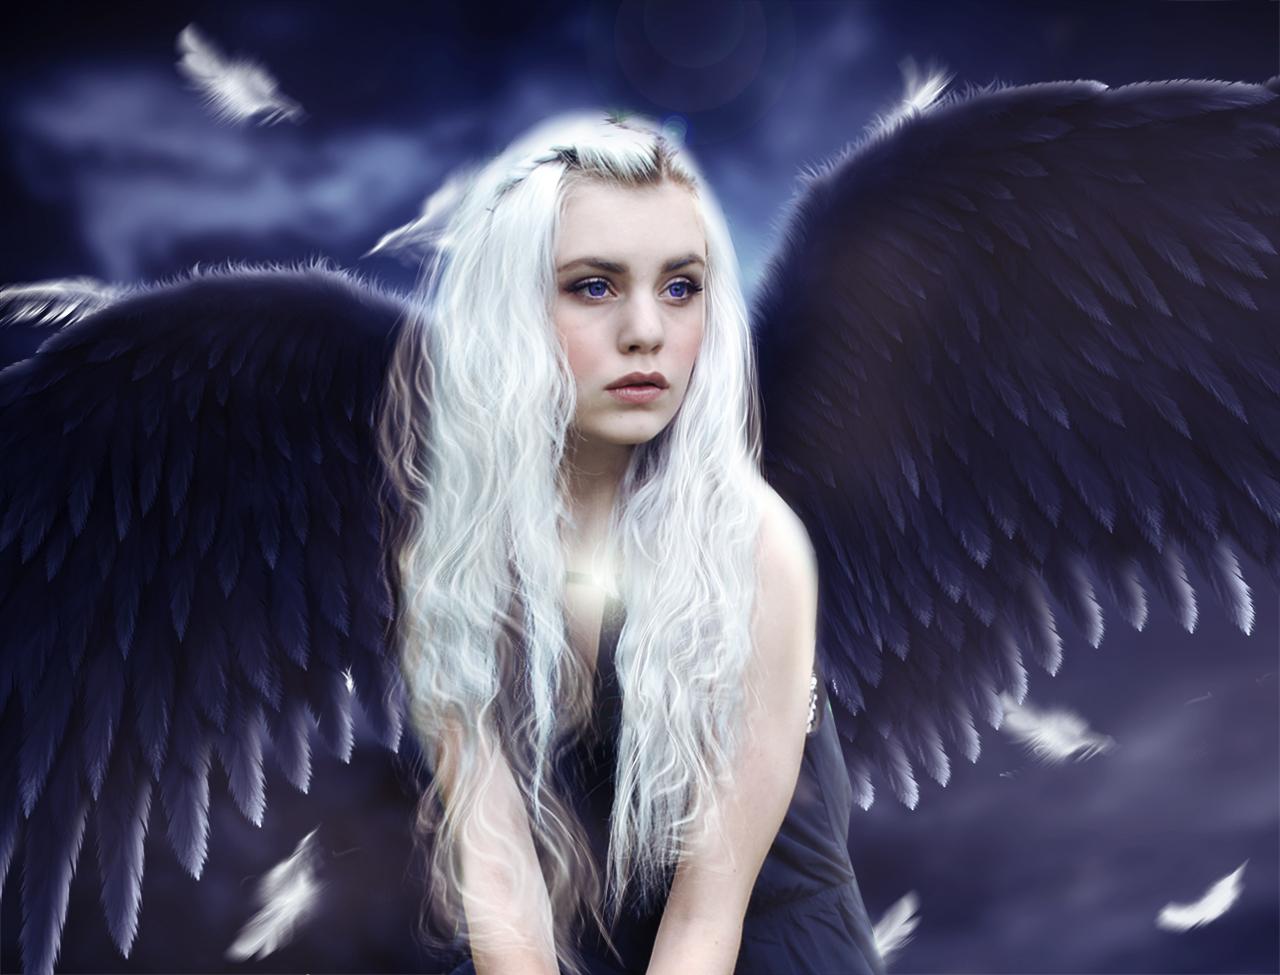 фото ангел с белыми волосами школе